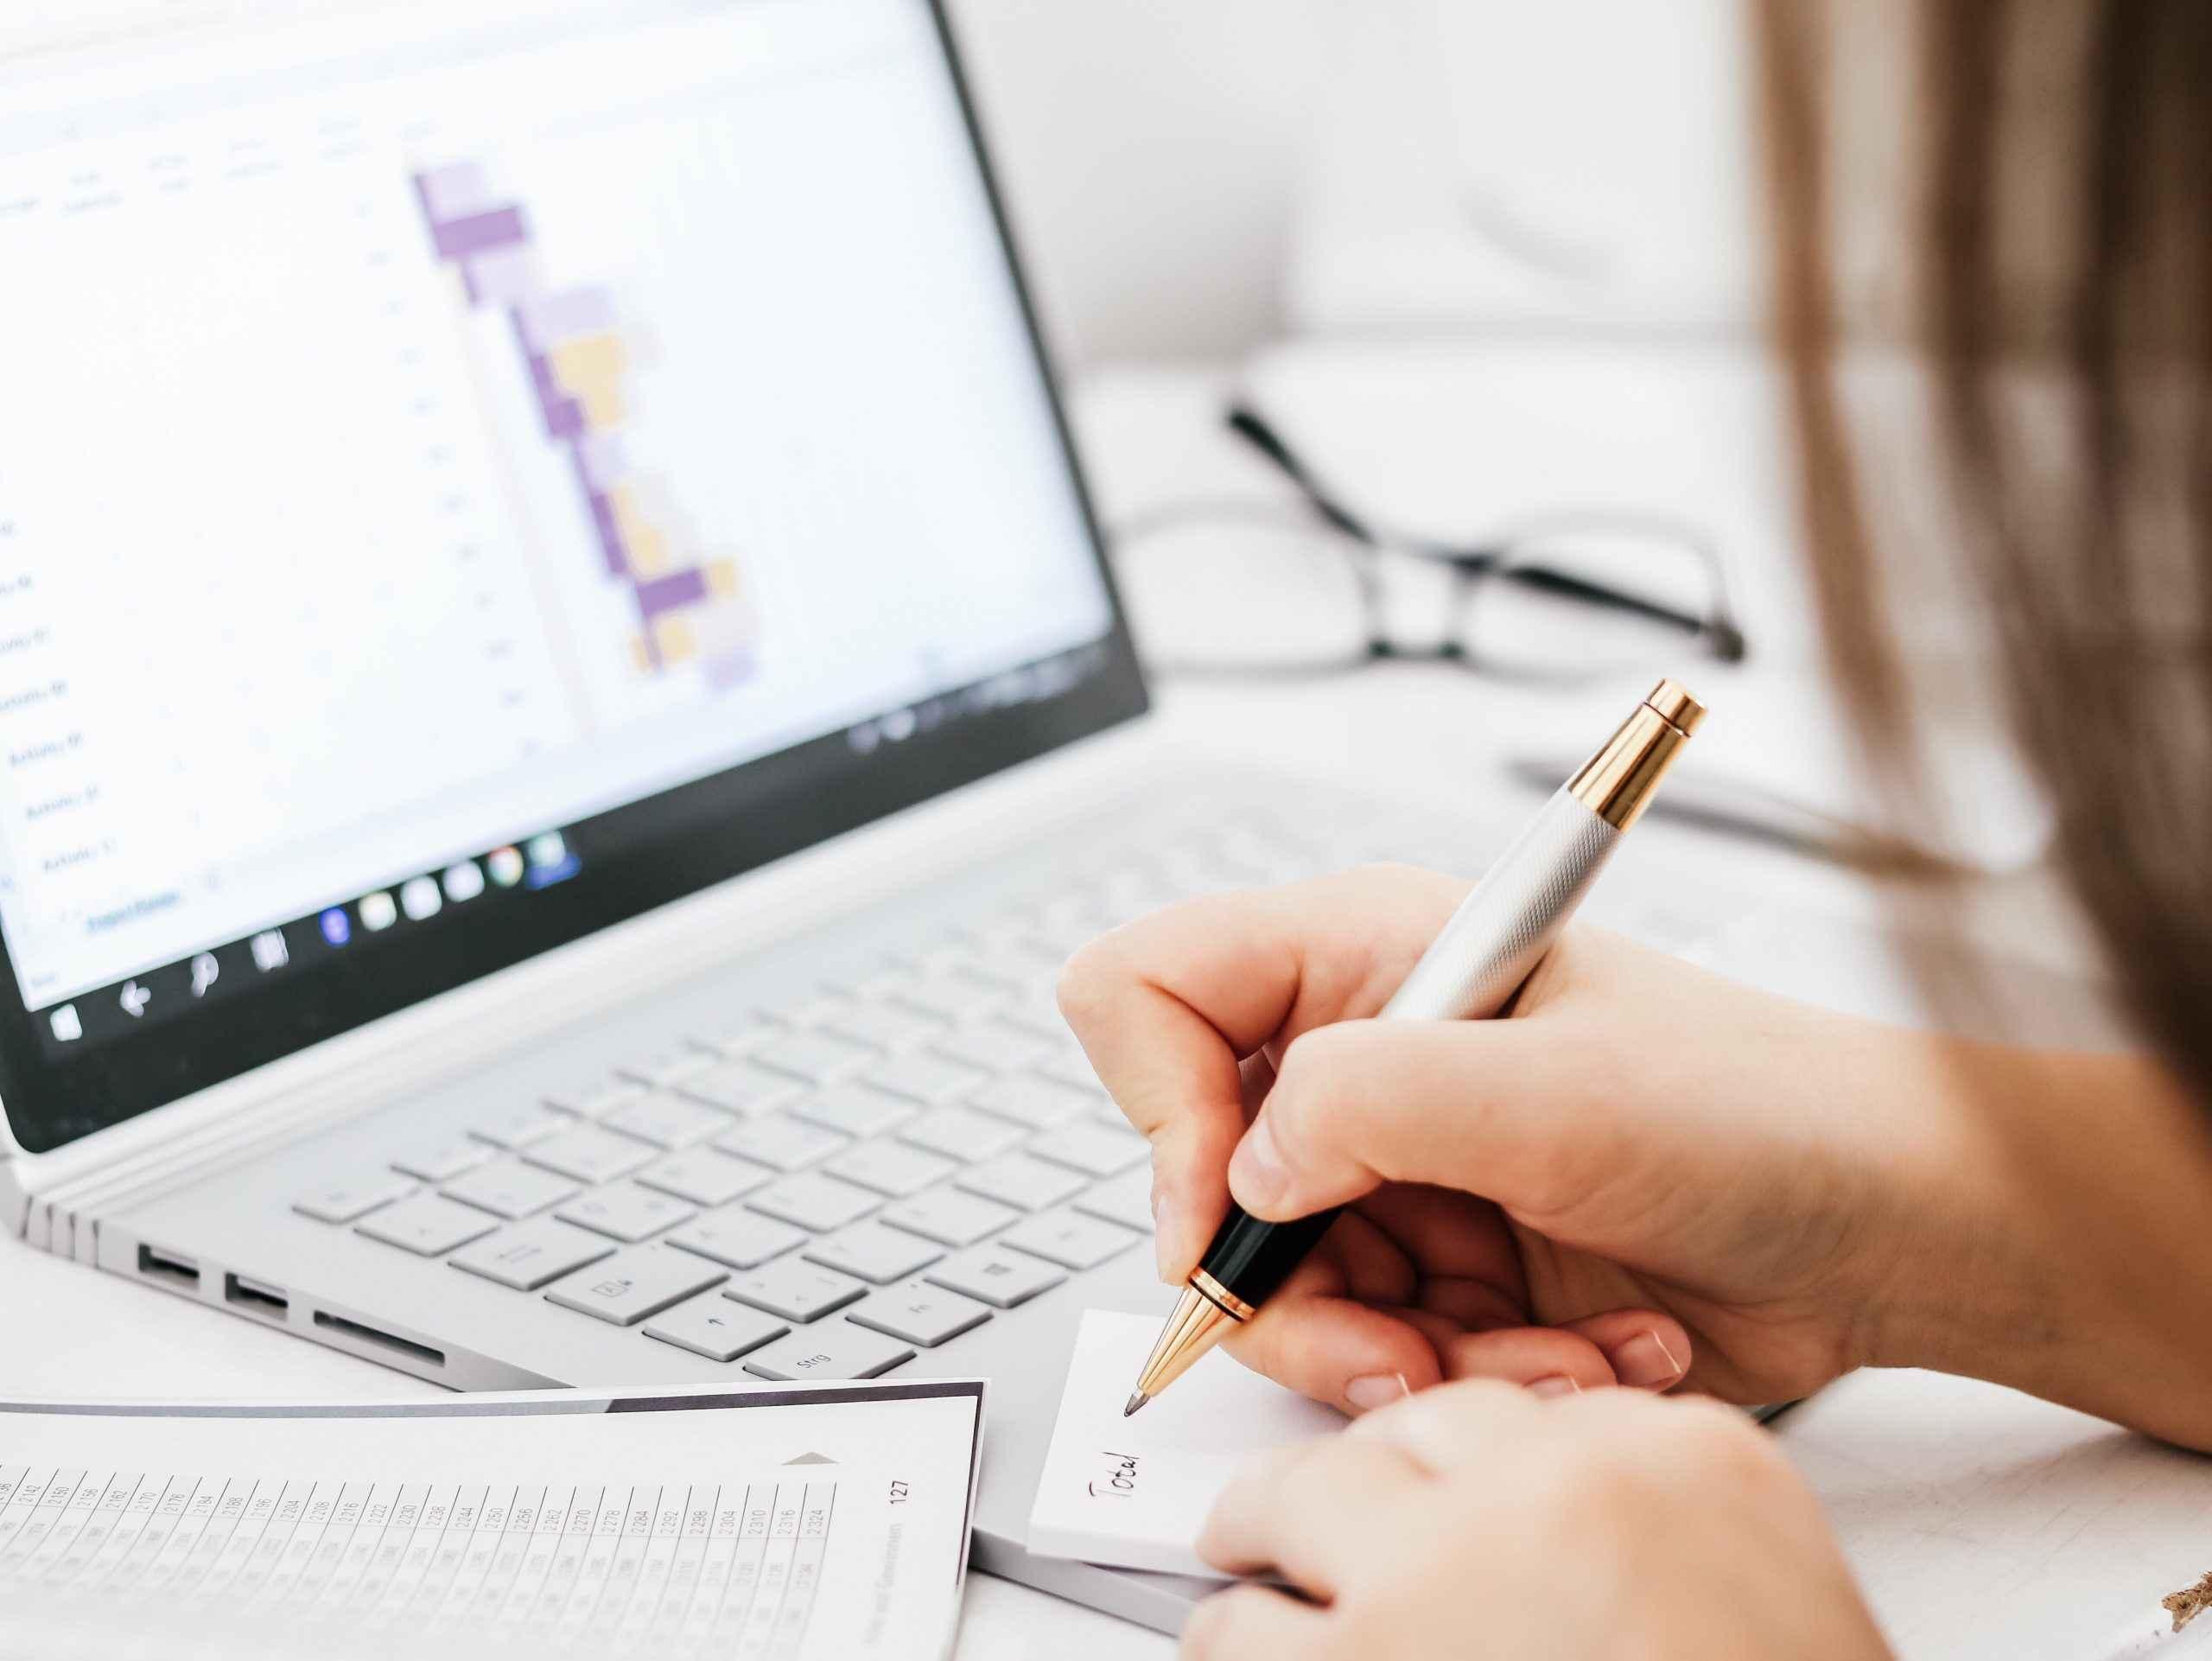 woman writing laptop keyboard graph profit and los J79NQJM scaled